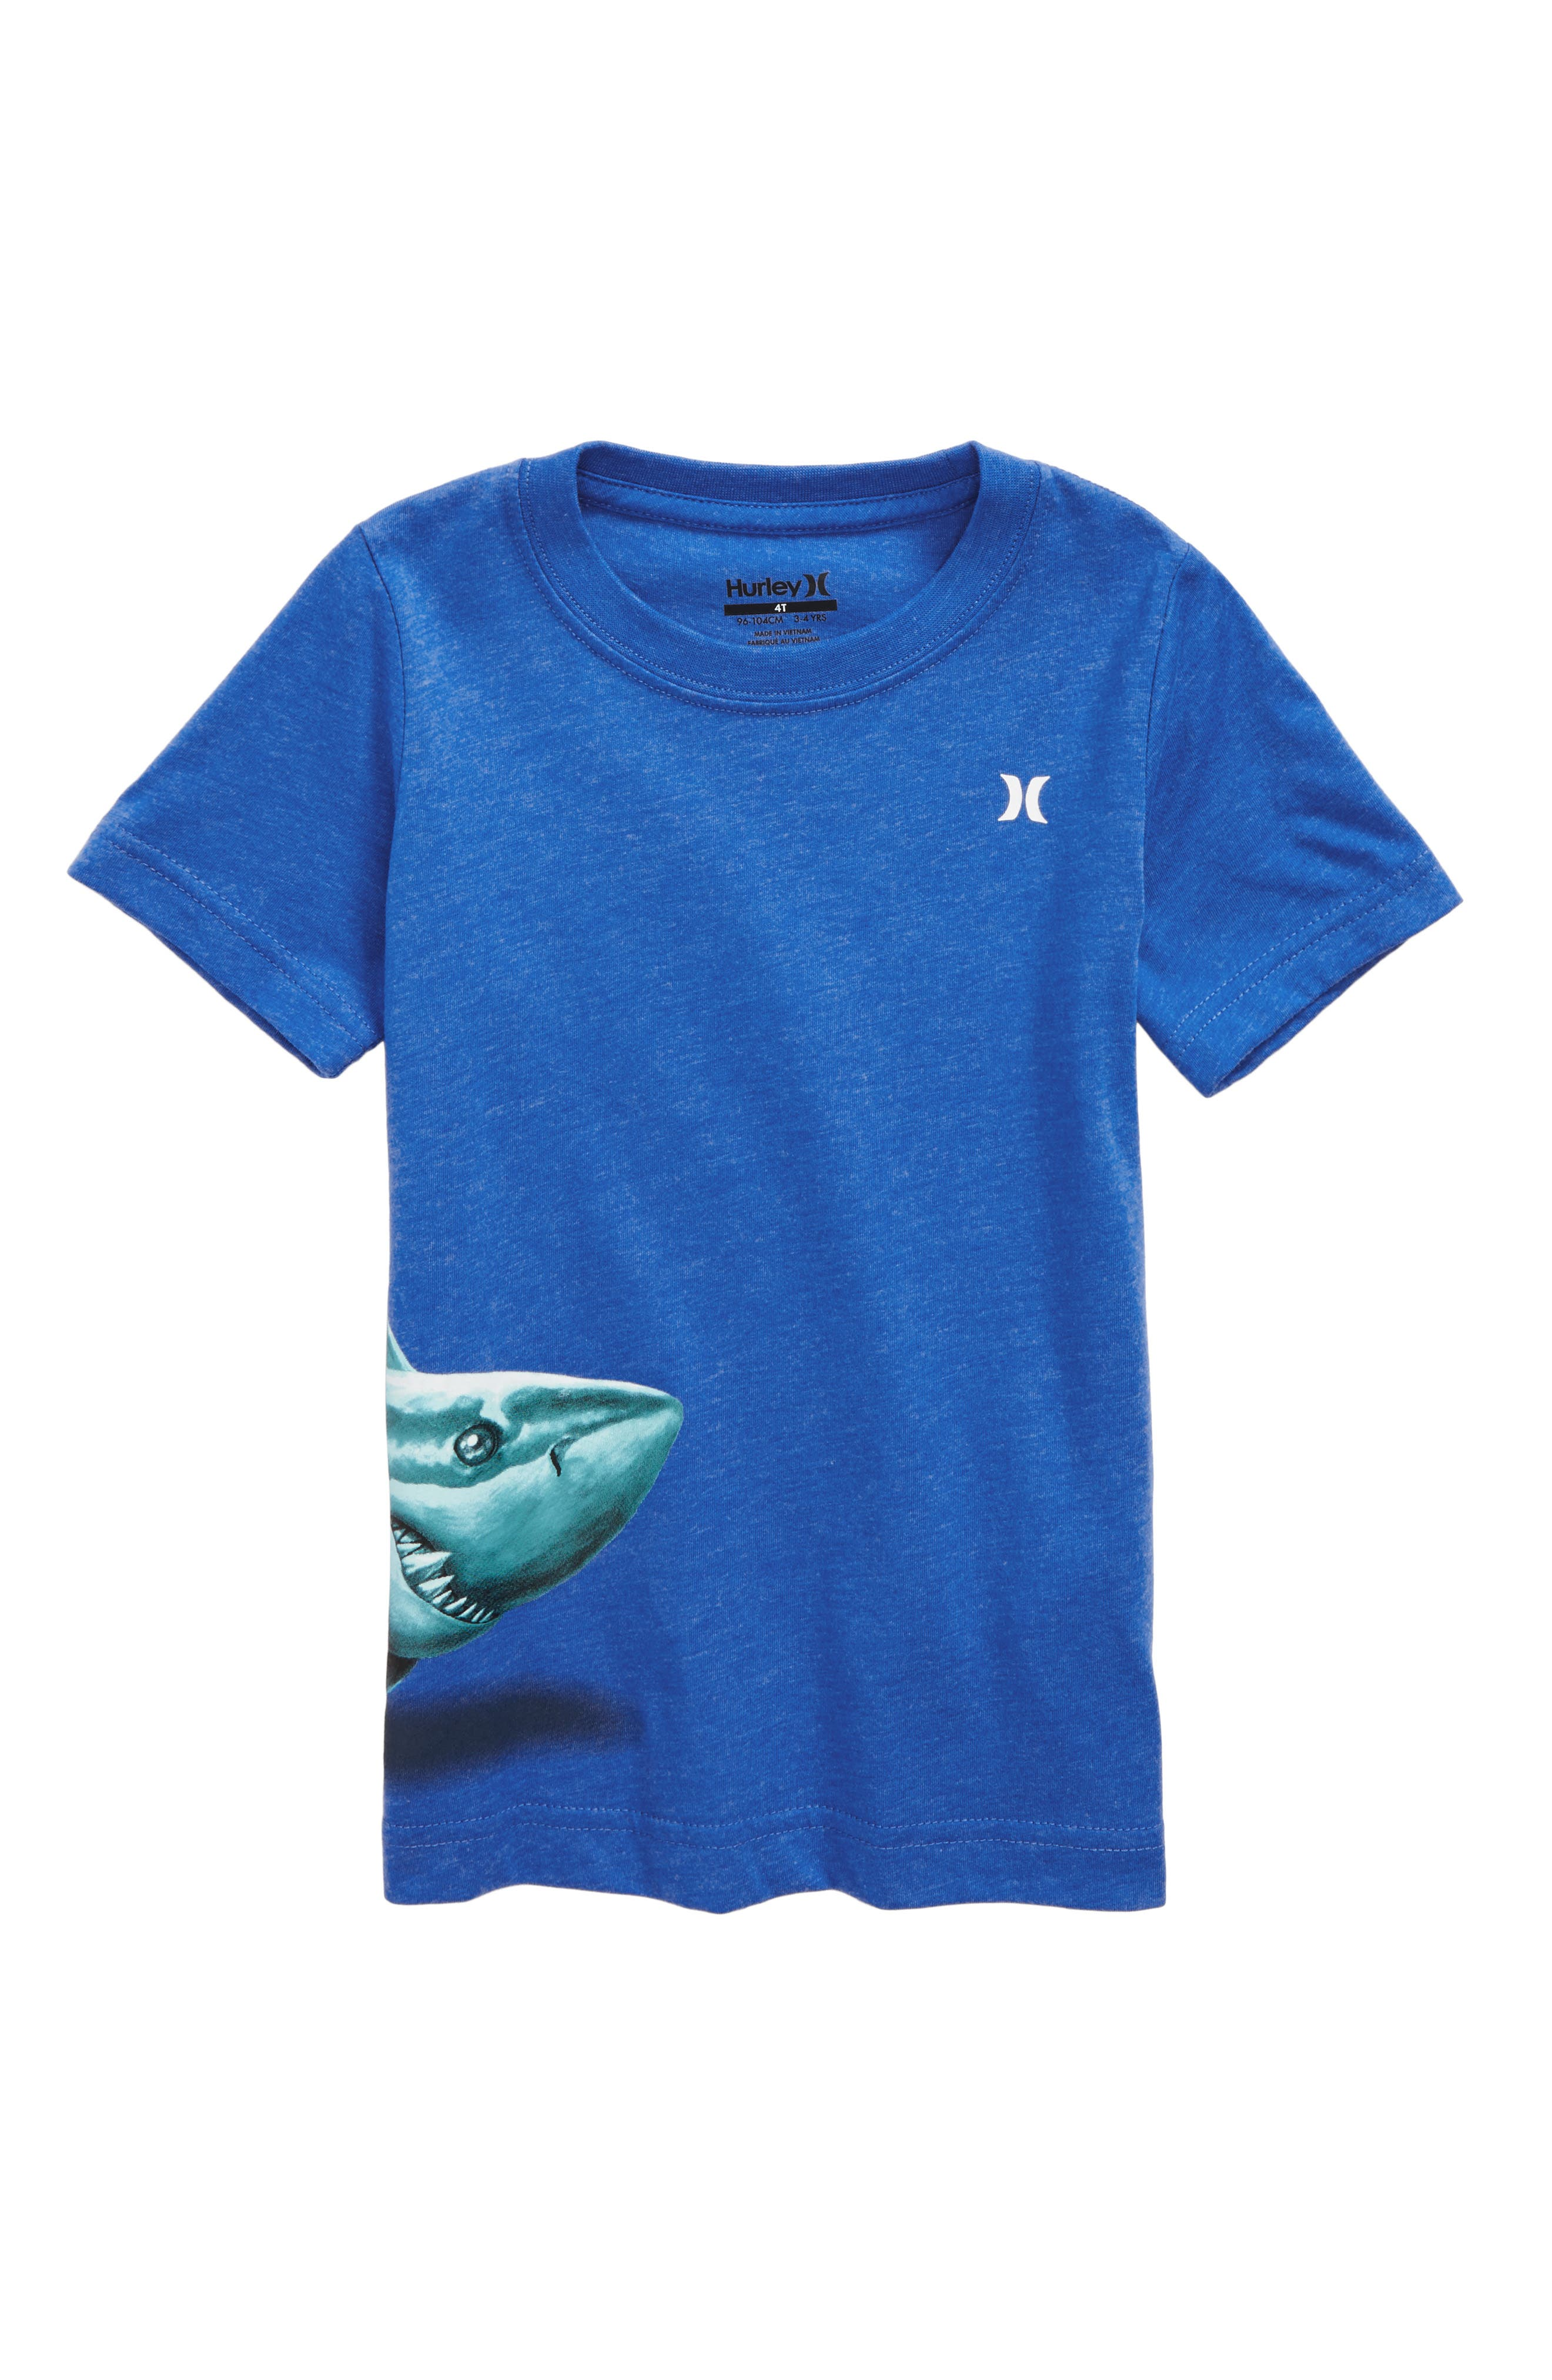 Hurley Sharky T-Shirt (Toddler Boys & Little Boys)